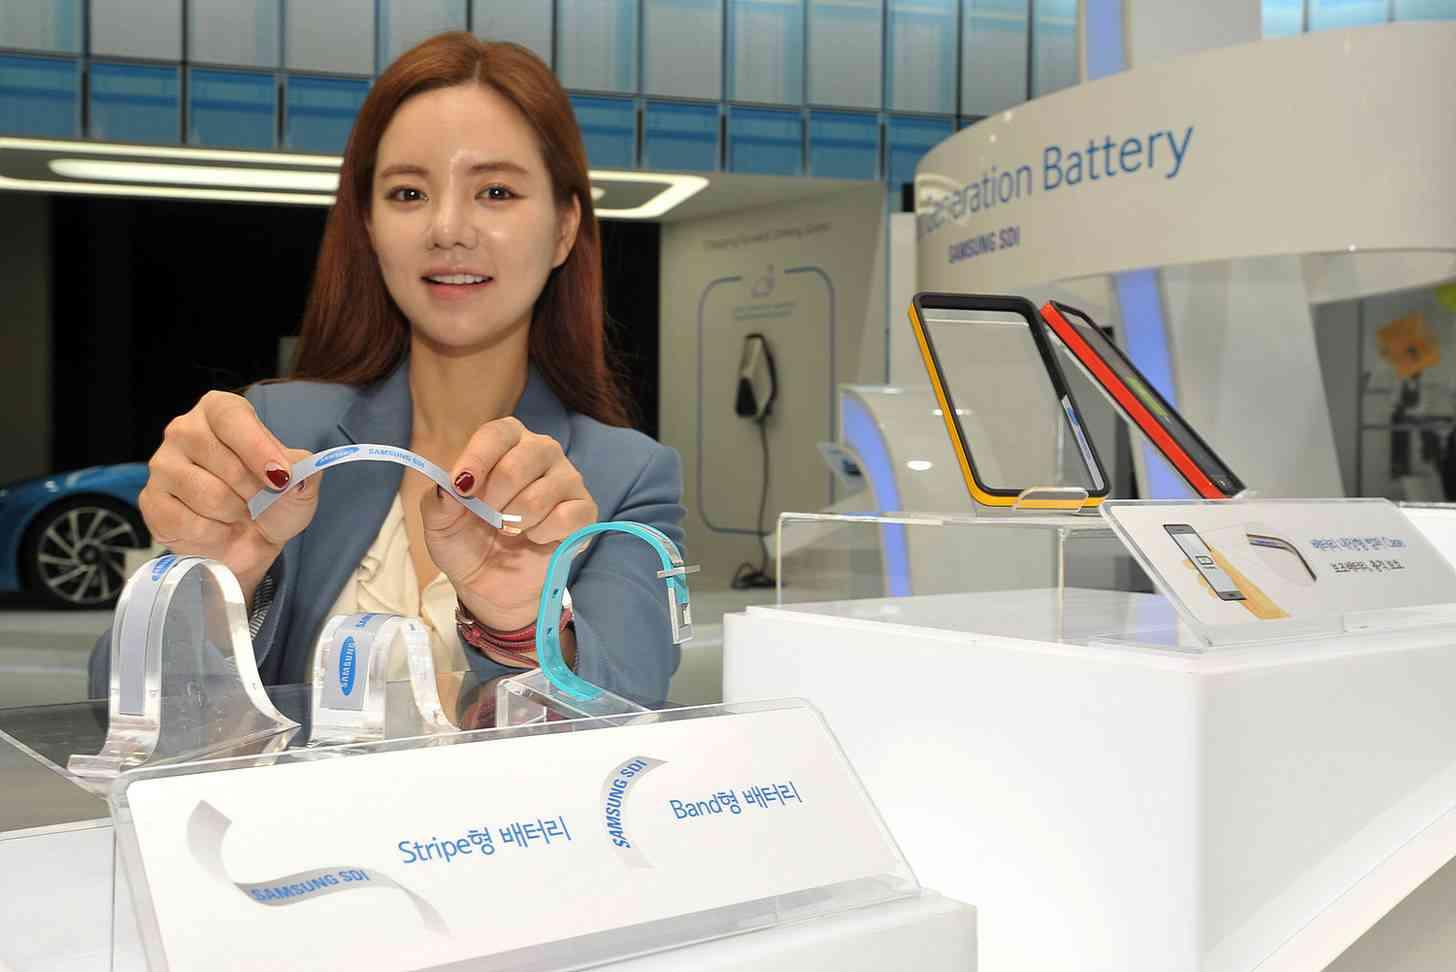 Samsung stripe battery